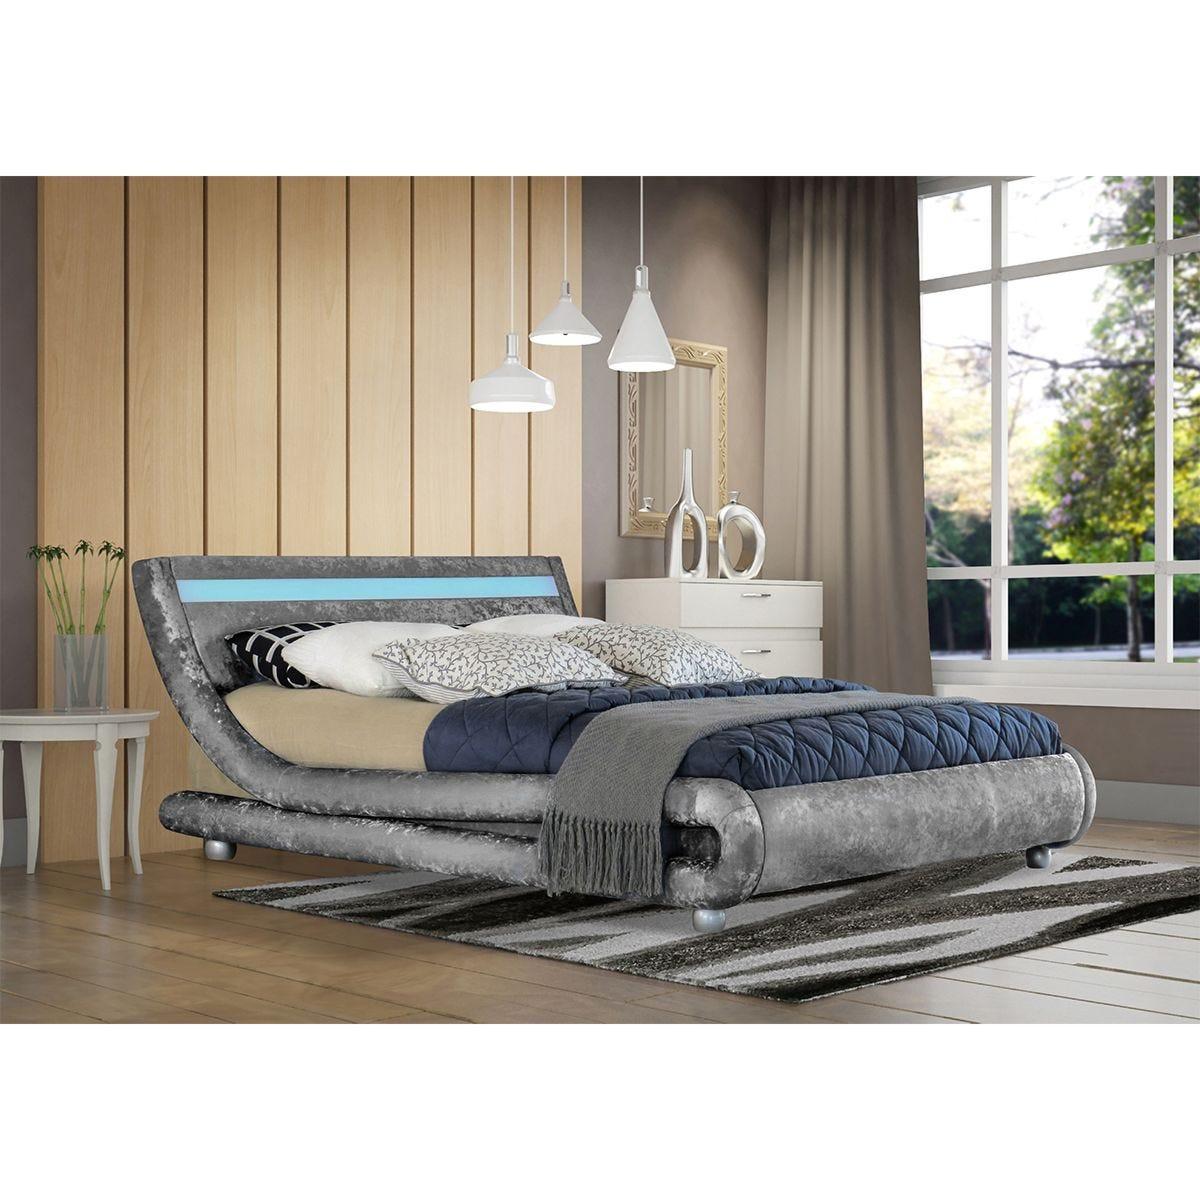 Elias LED Bed Frame - Silver